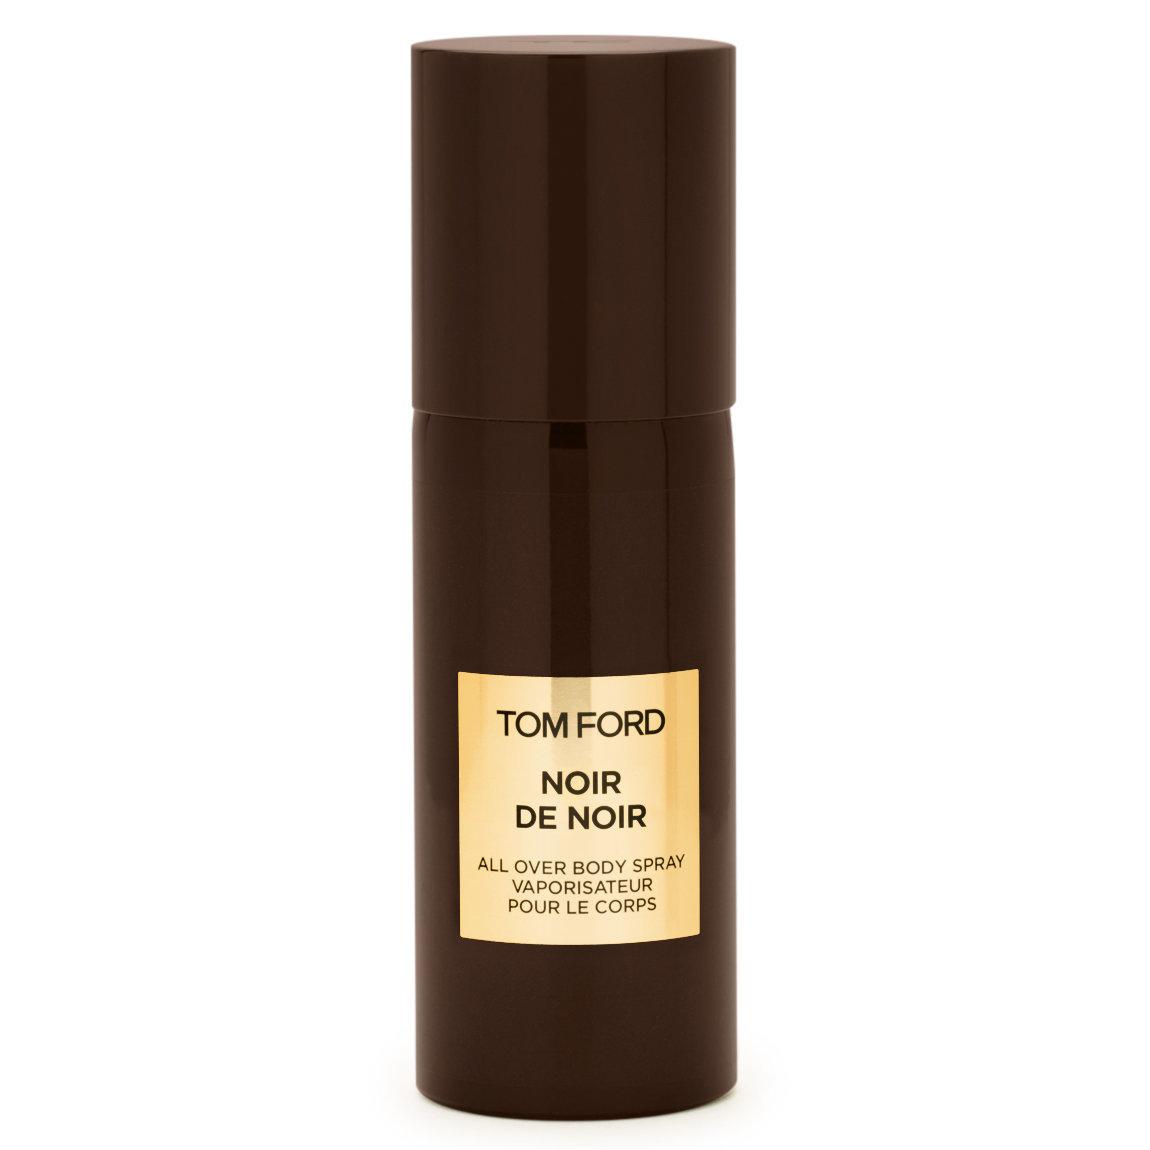 TOM FORD Noir de Noir All Over Body Spray product swatch.